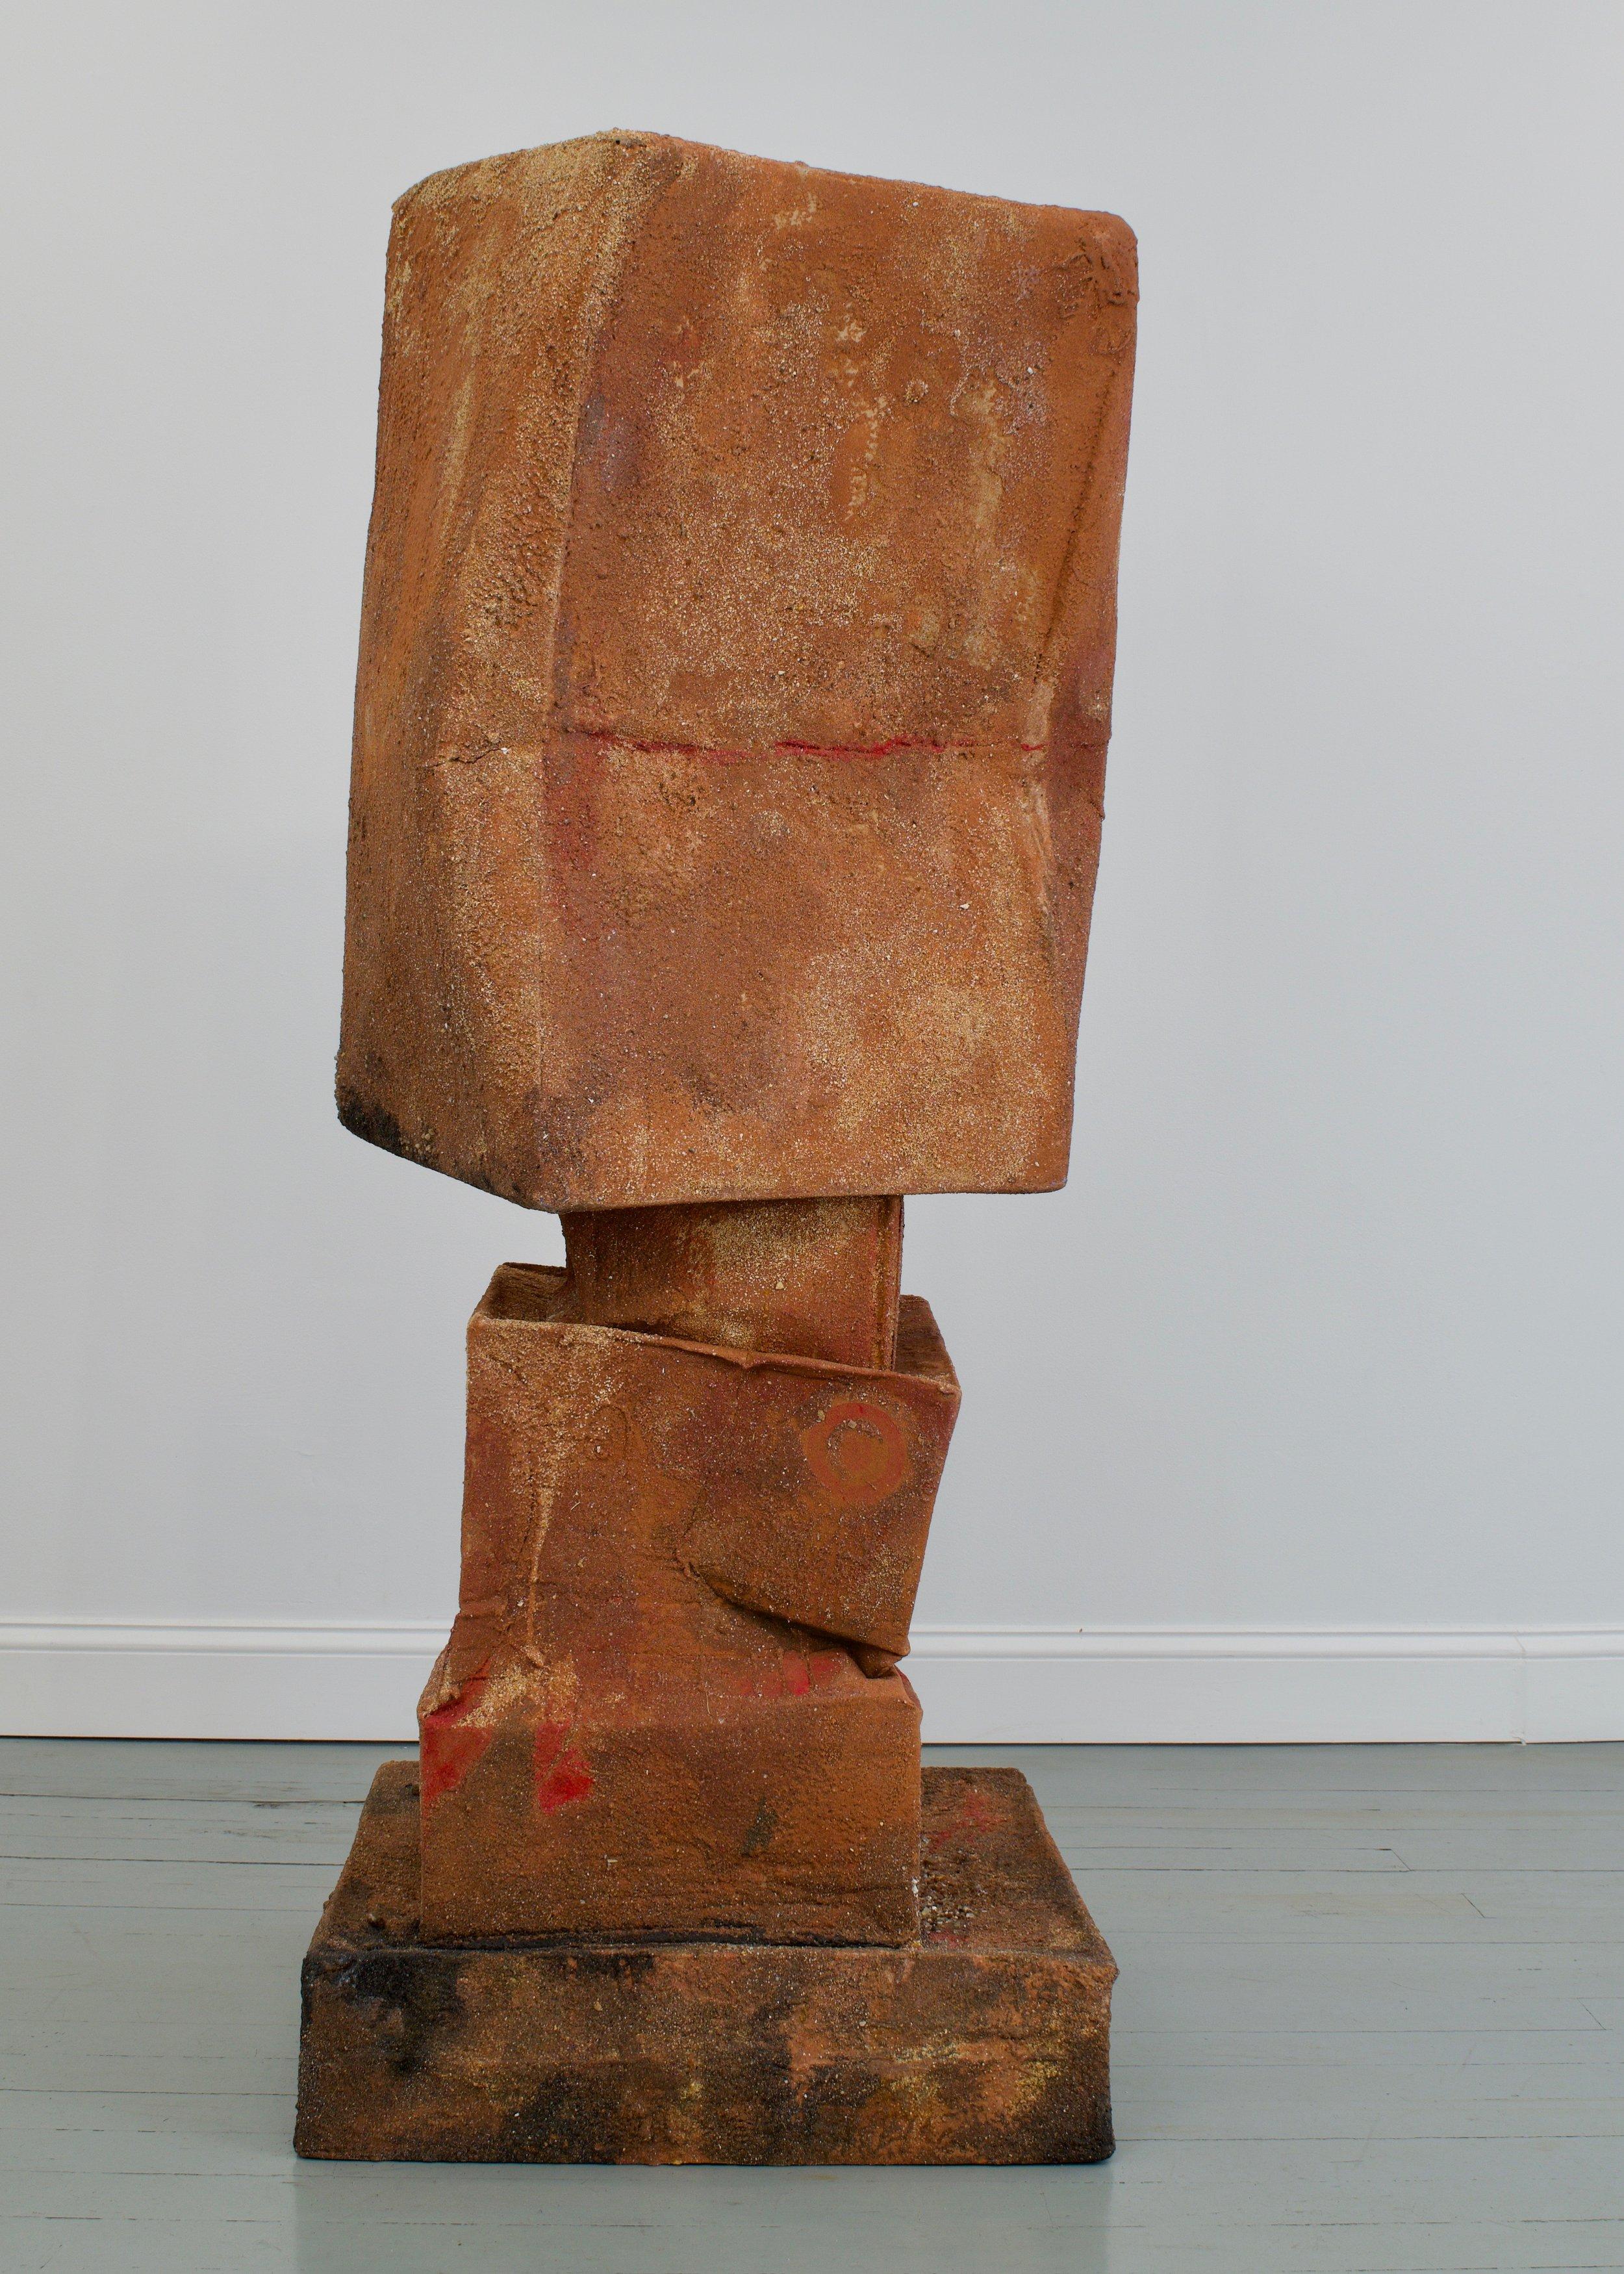 Mark Van Wagner, Drifter, 2019. Cardboard, sand, polymer glues. 69 x 23 x 23 in